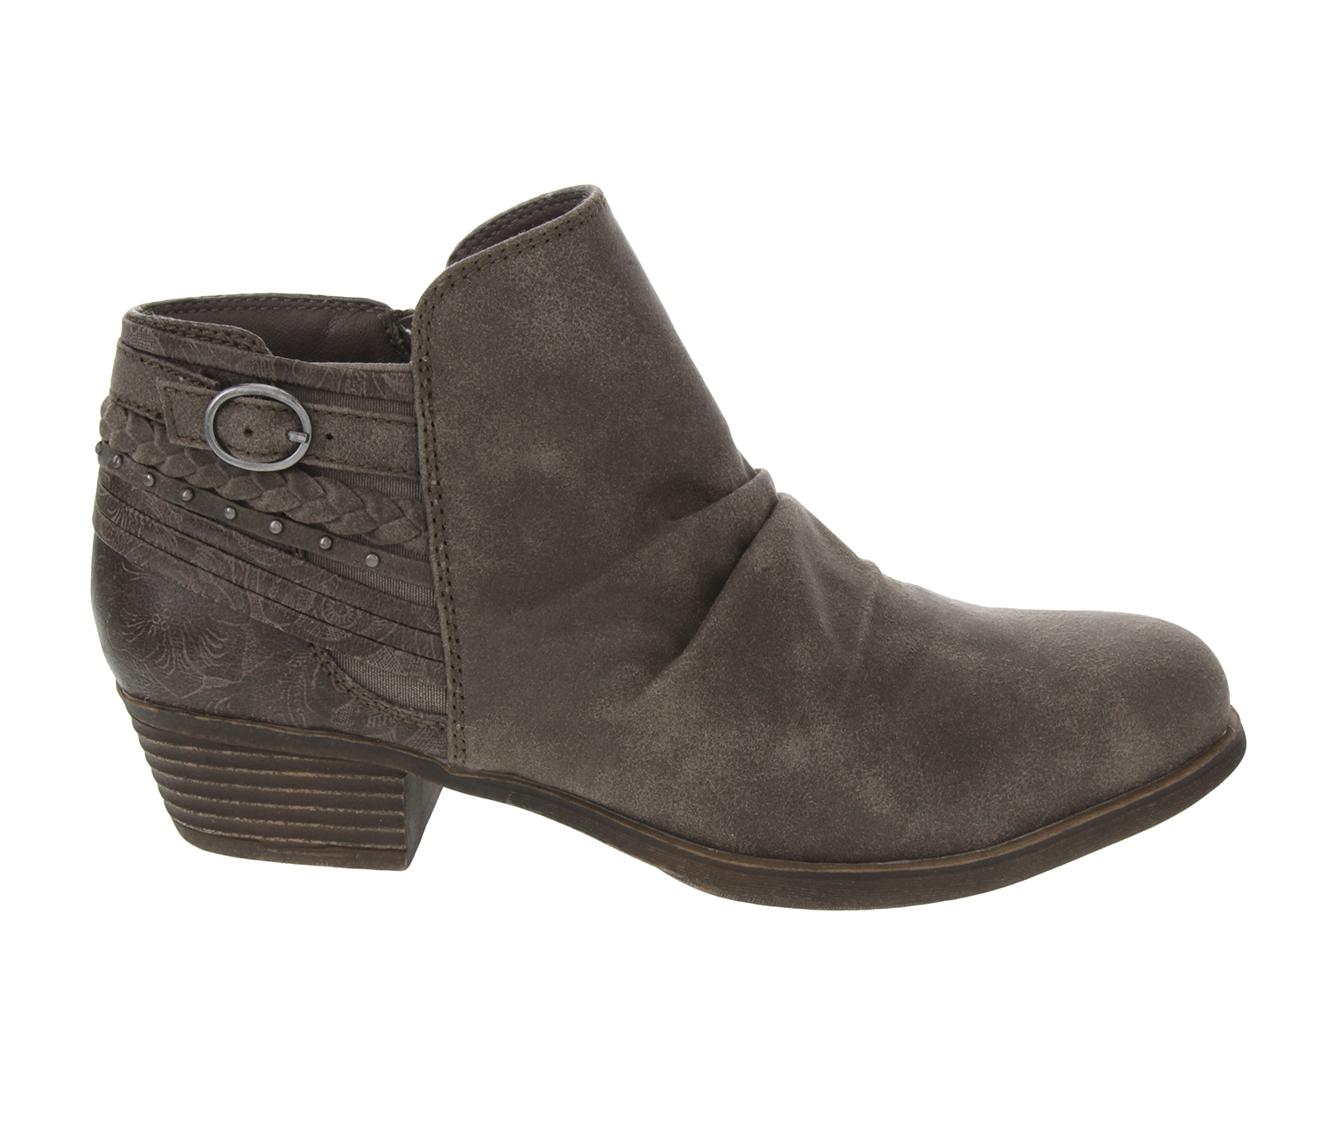 Sugar Tali Women's Boot (Gray Canvas)